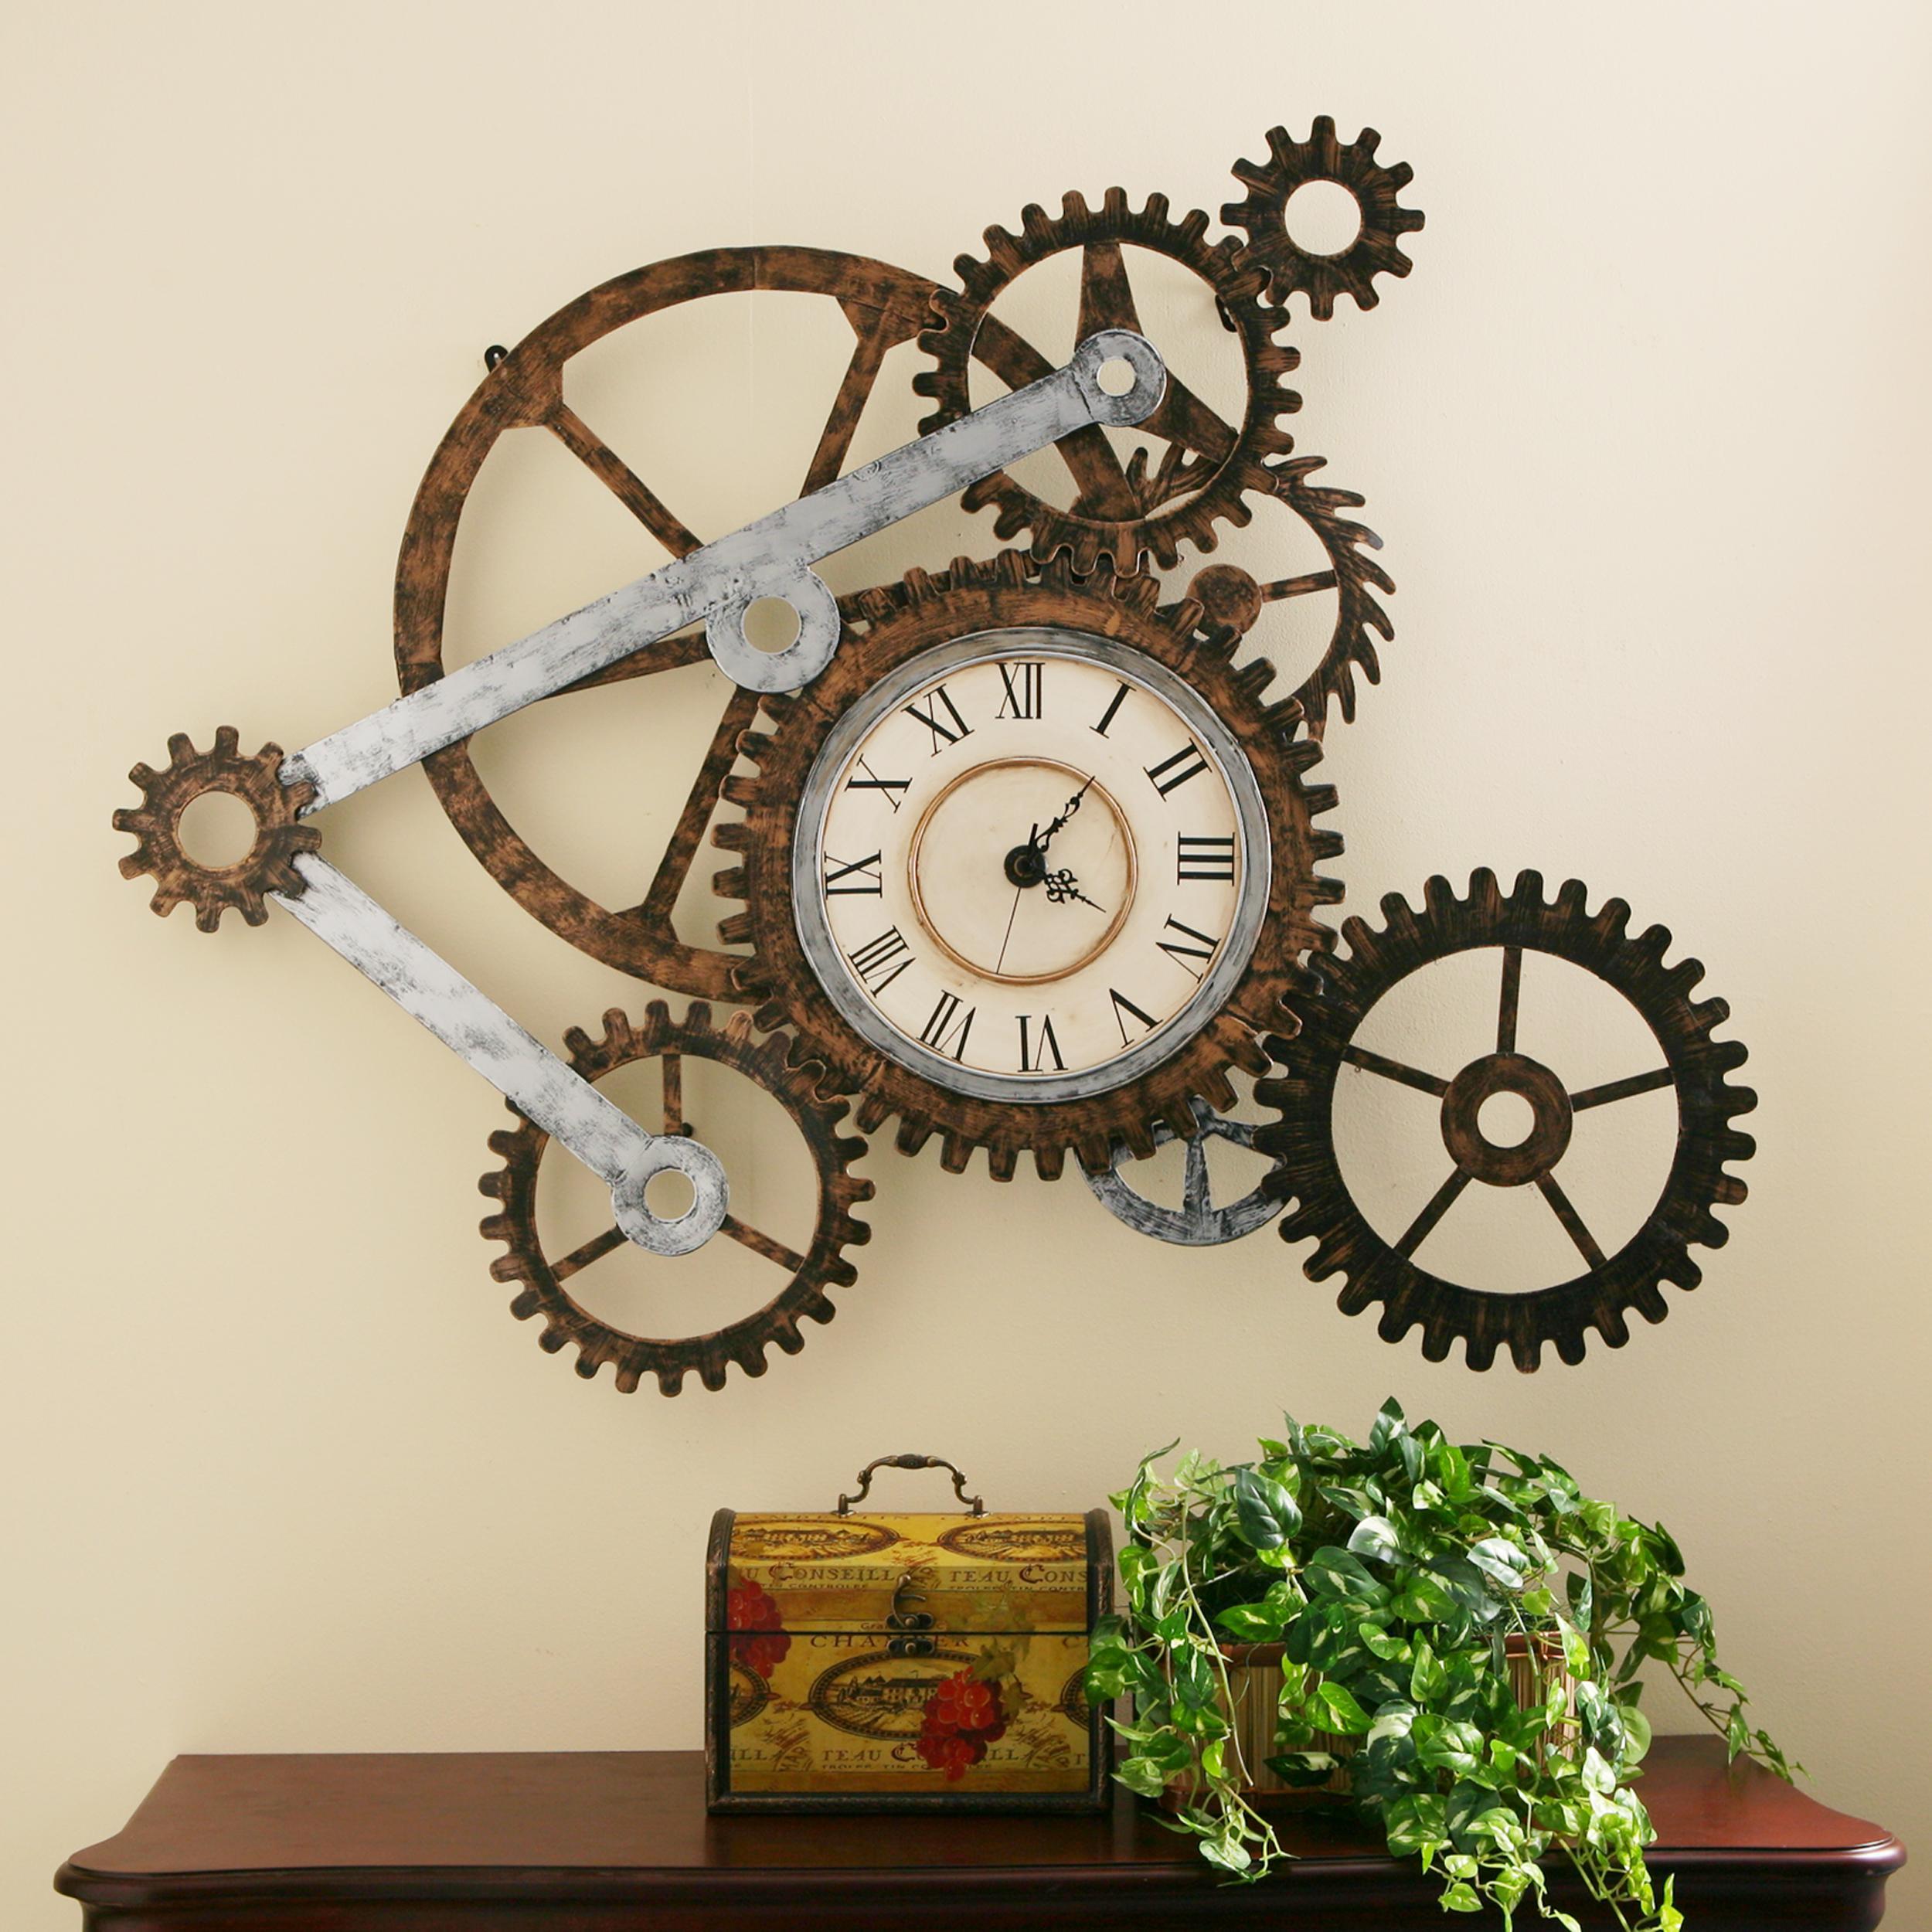 Декор часов в стиле лофт